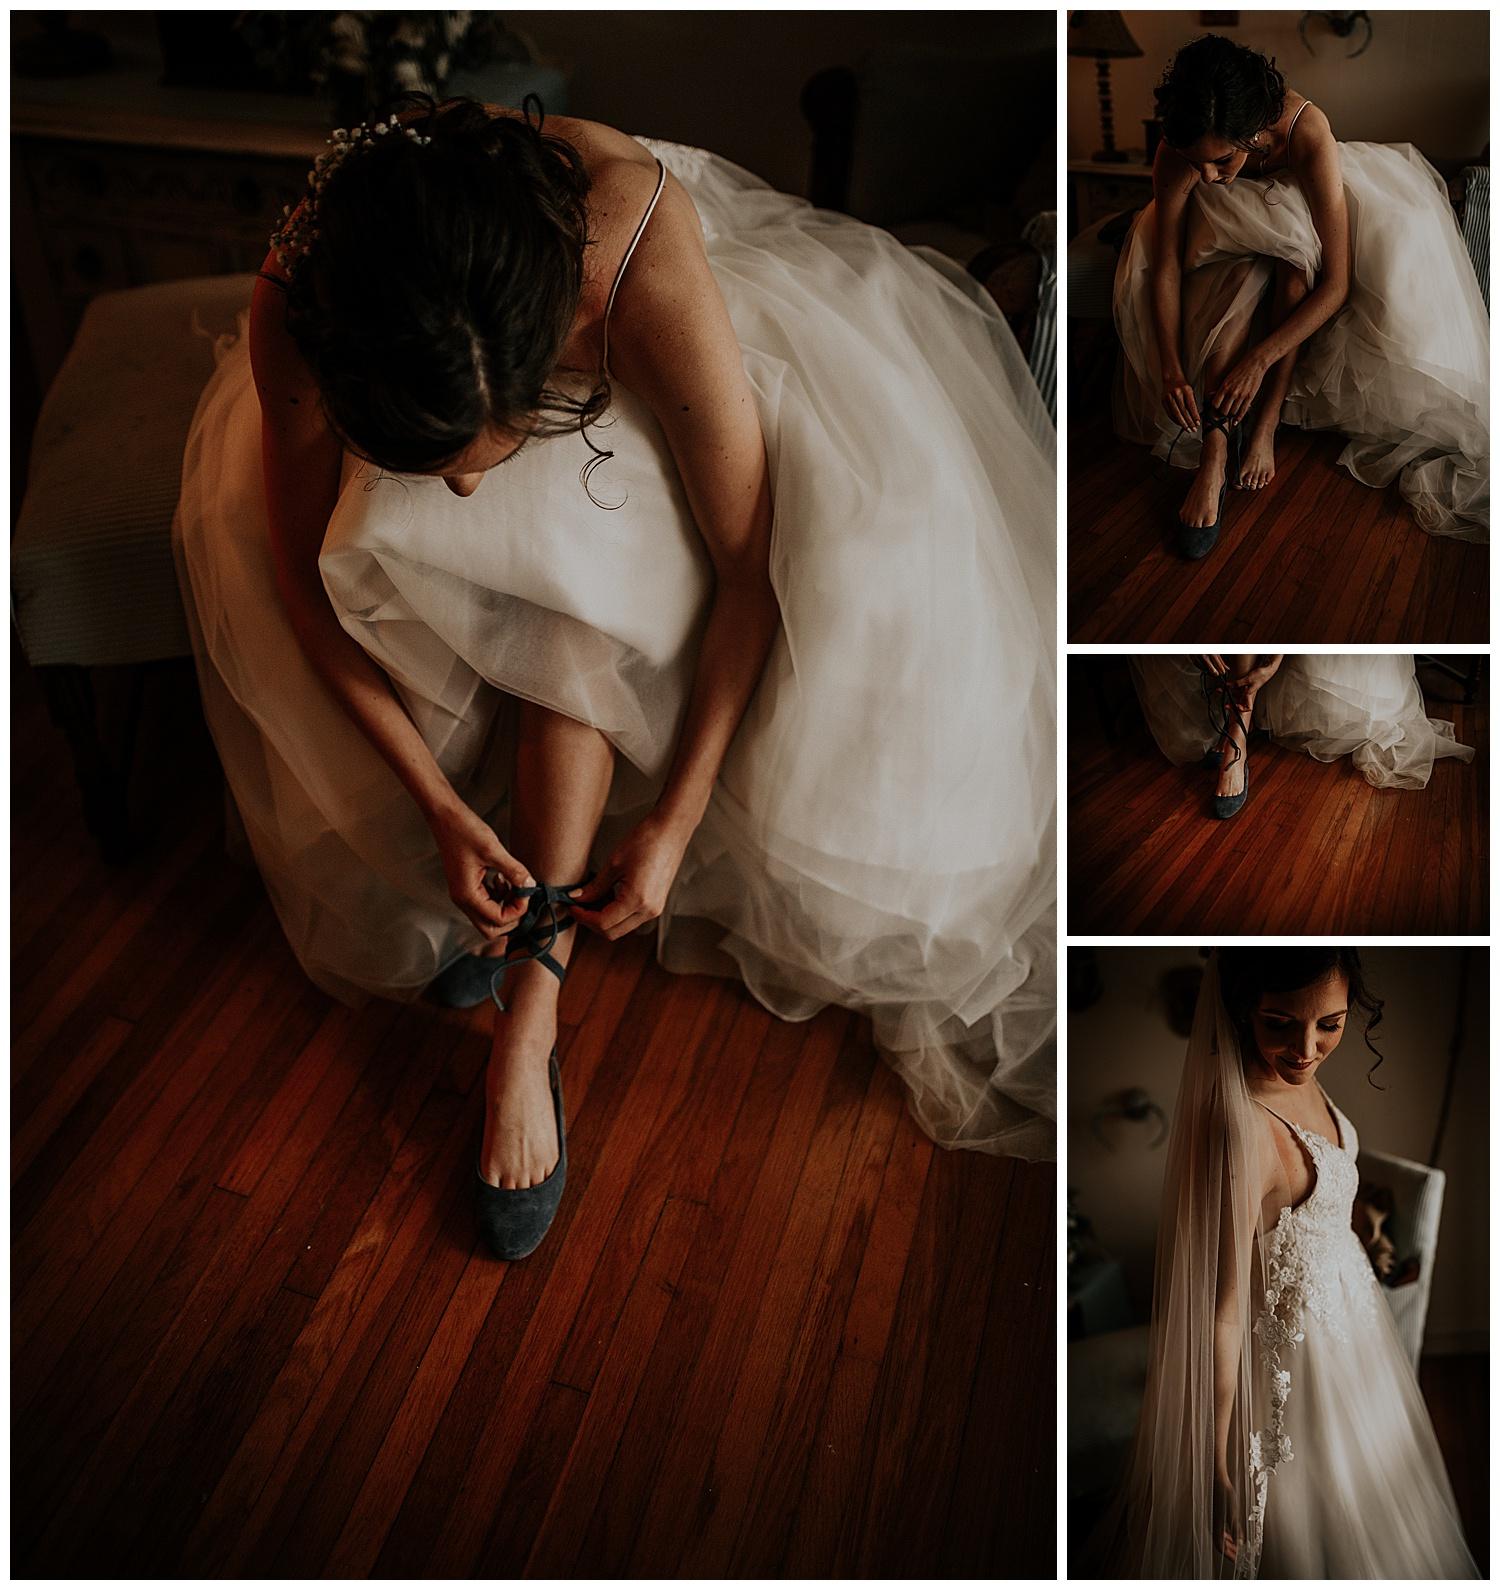 Laken-Mackenzie-Photography-Burge-Wedding-Stillwater-Meadow-Aledo-Texas-Dallas-Fort-Worth-Wedding-Photographer10.jpg